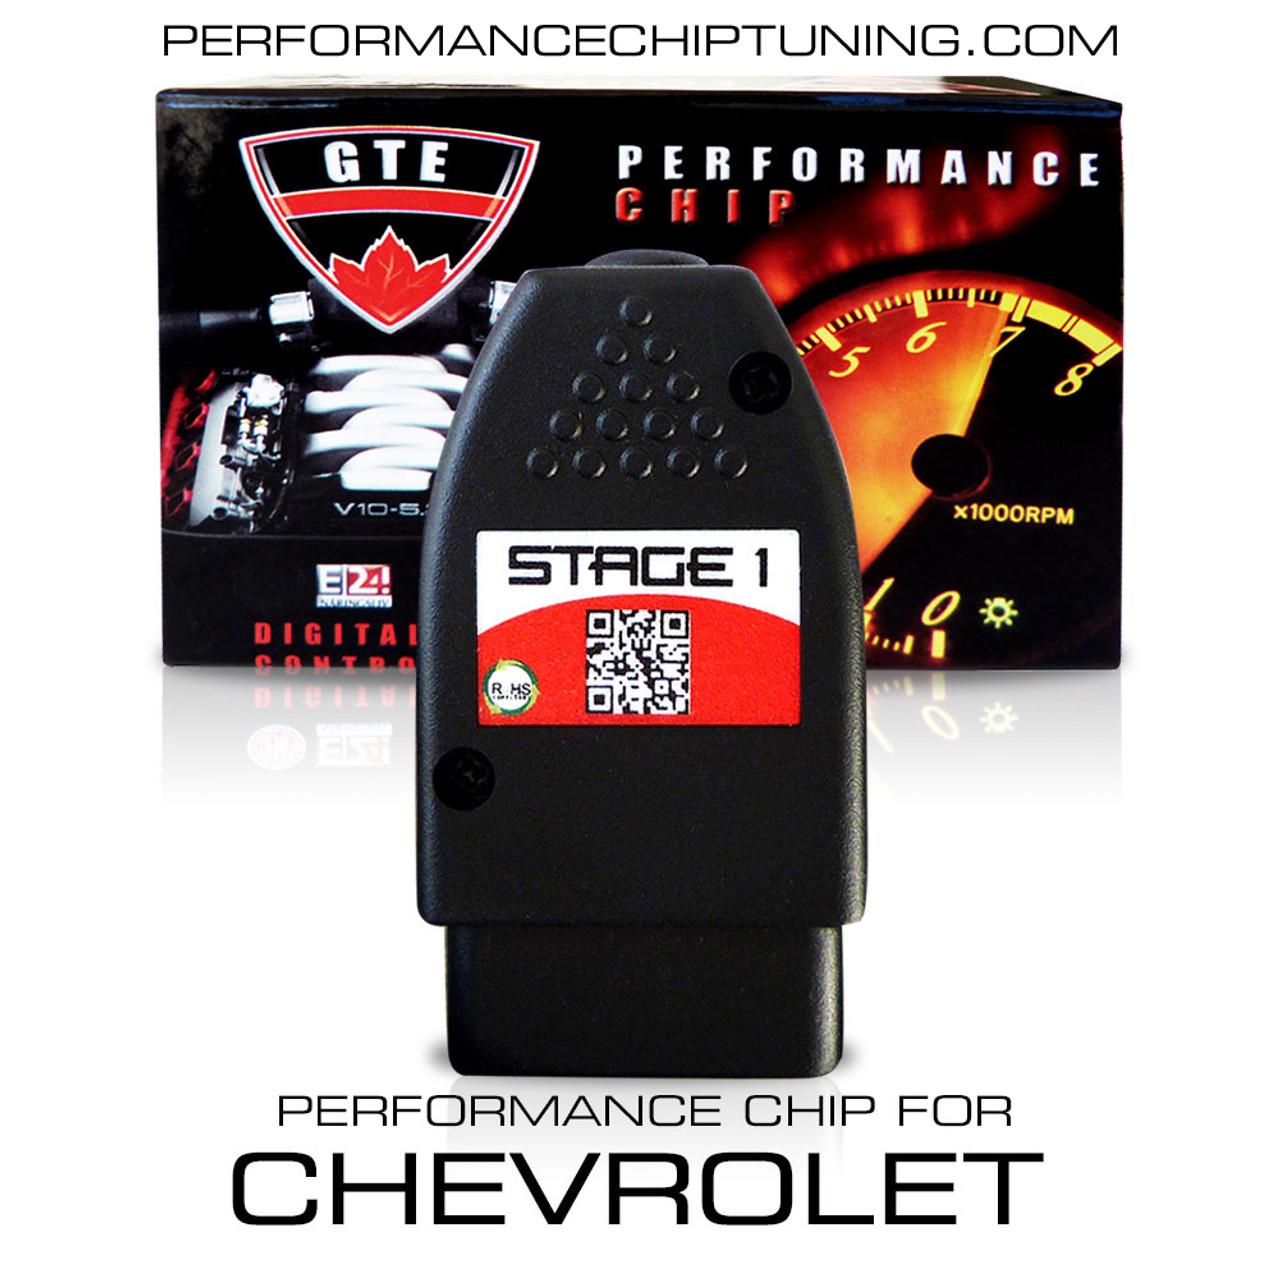 FOR GMC SIERRA DURAMAX Diesel OBD2 Performance Chip--Save Fuel Add Power//Torque